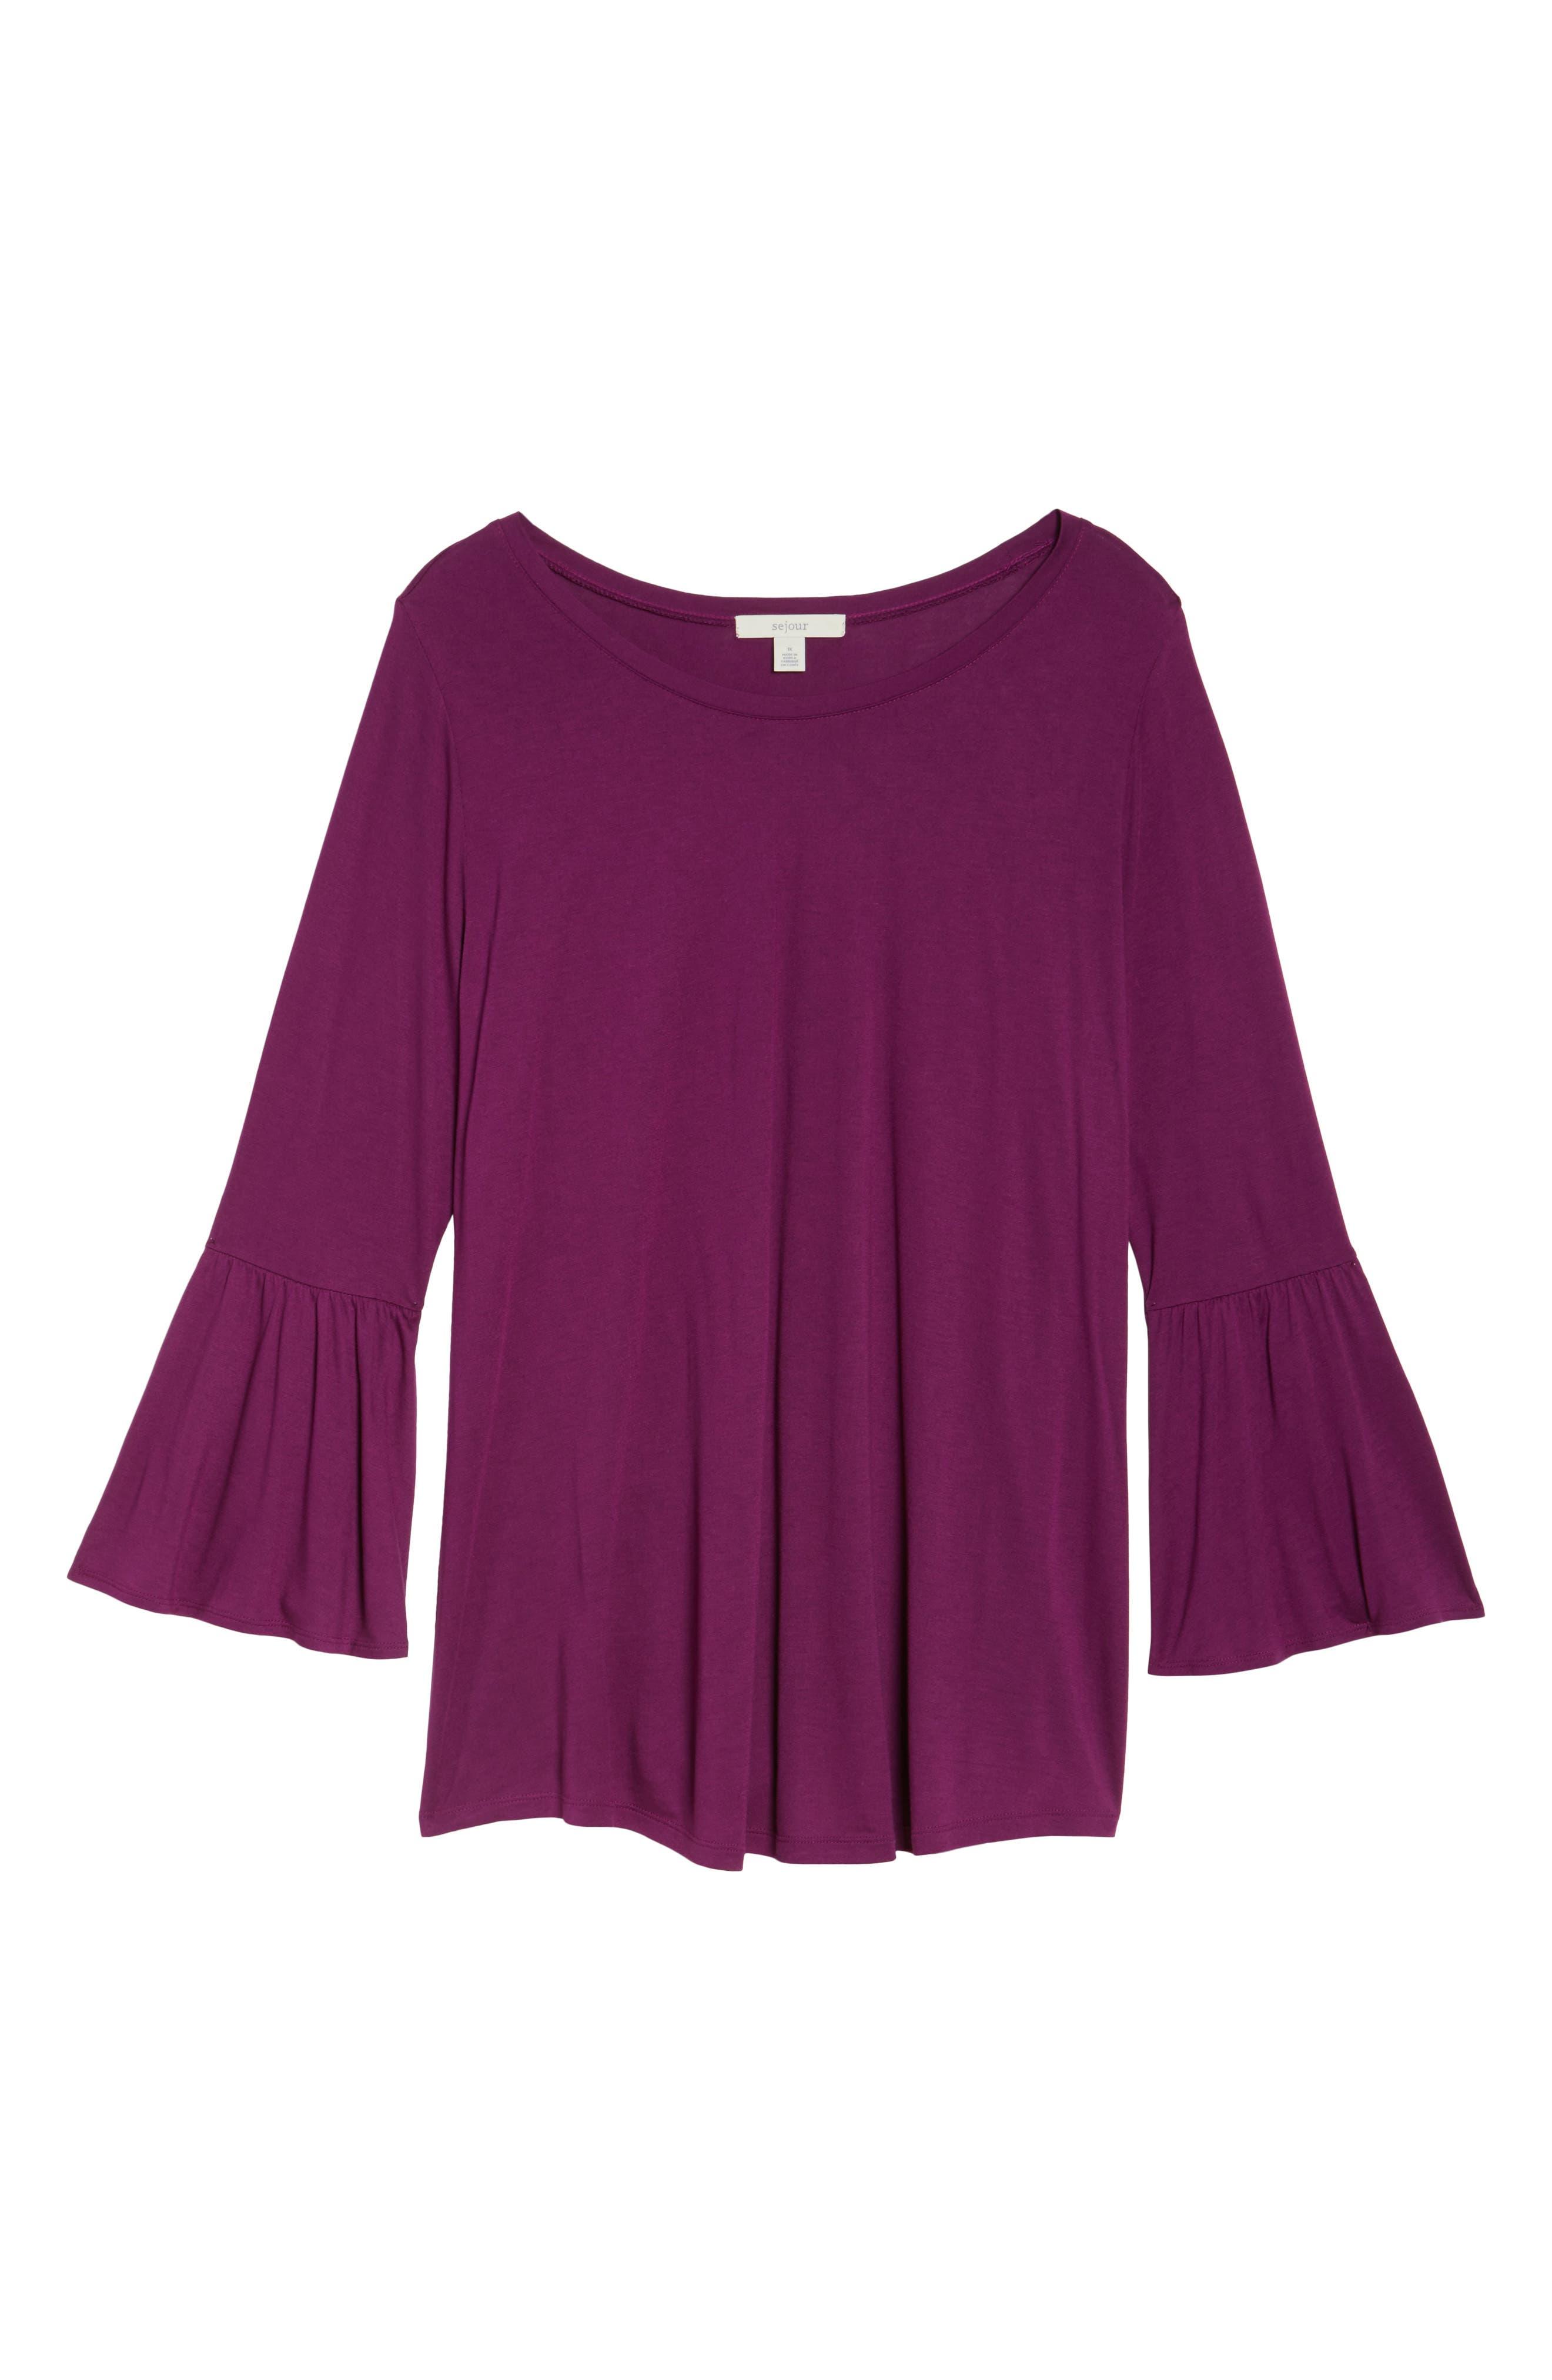 Bell Sleeve Tee,                             Alternate thumbnail 6, color,                             Purple Dark